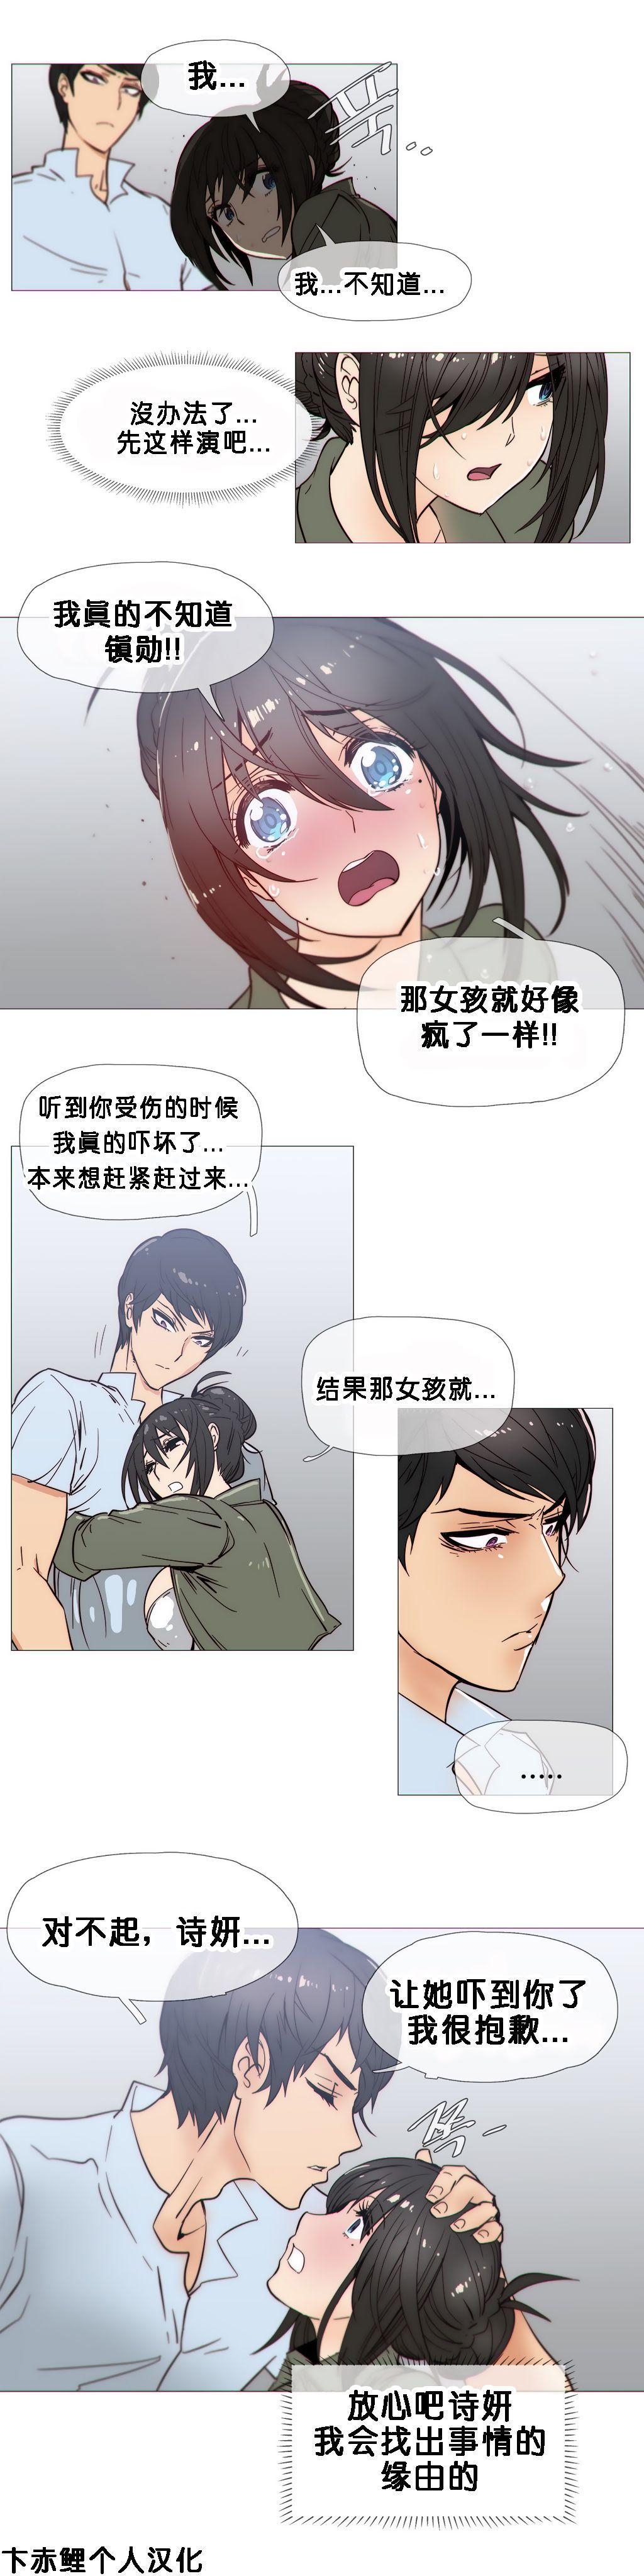 HouseHold Affairs 【卞赤鲤个人汉化】1~33话(持续更新中) 506